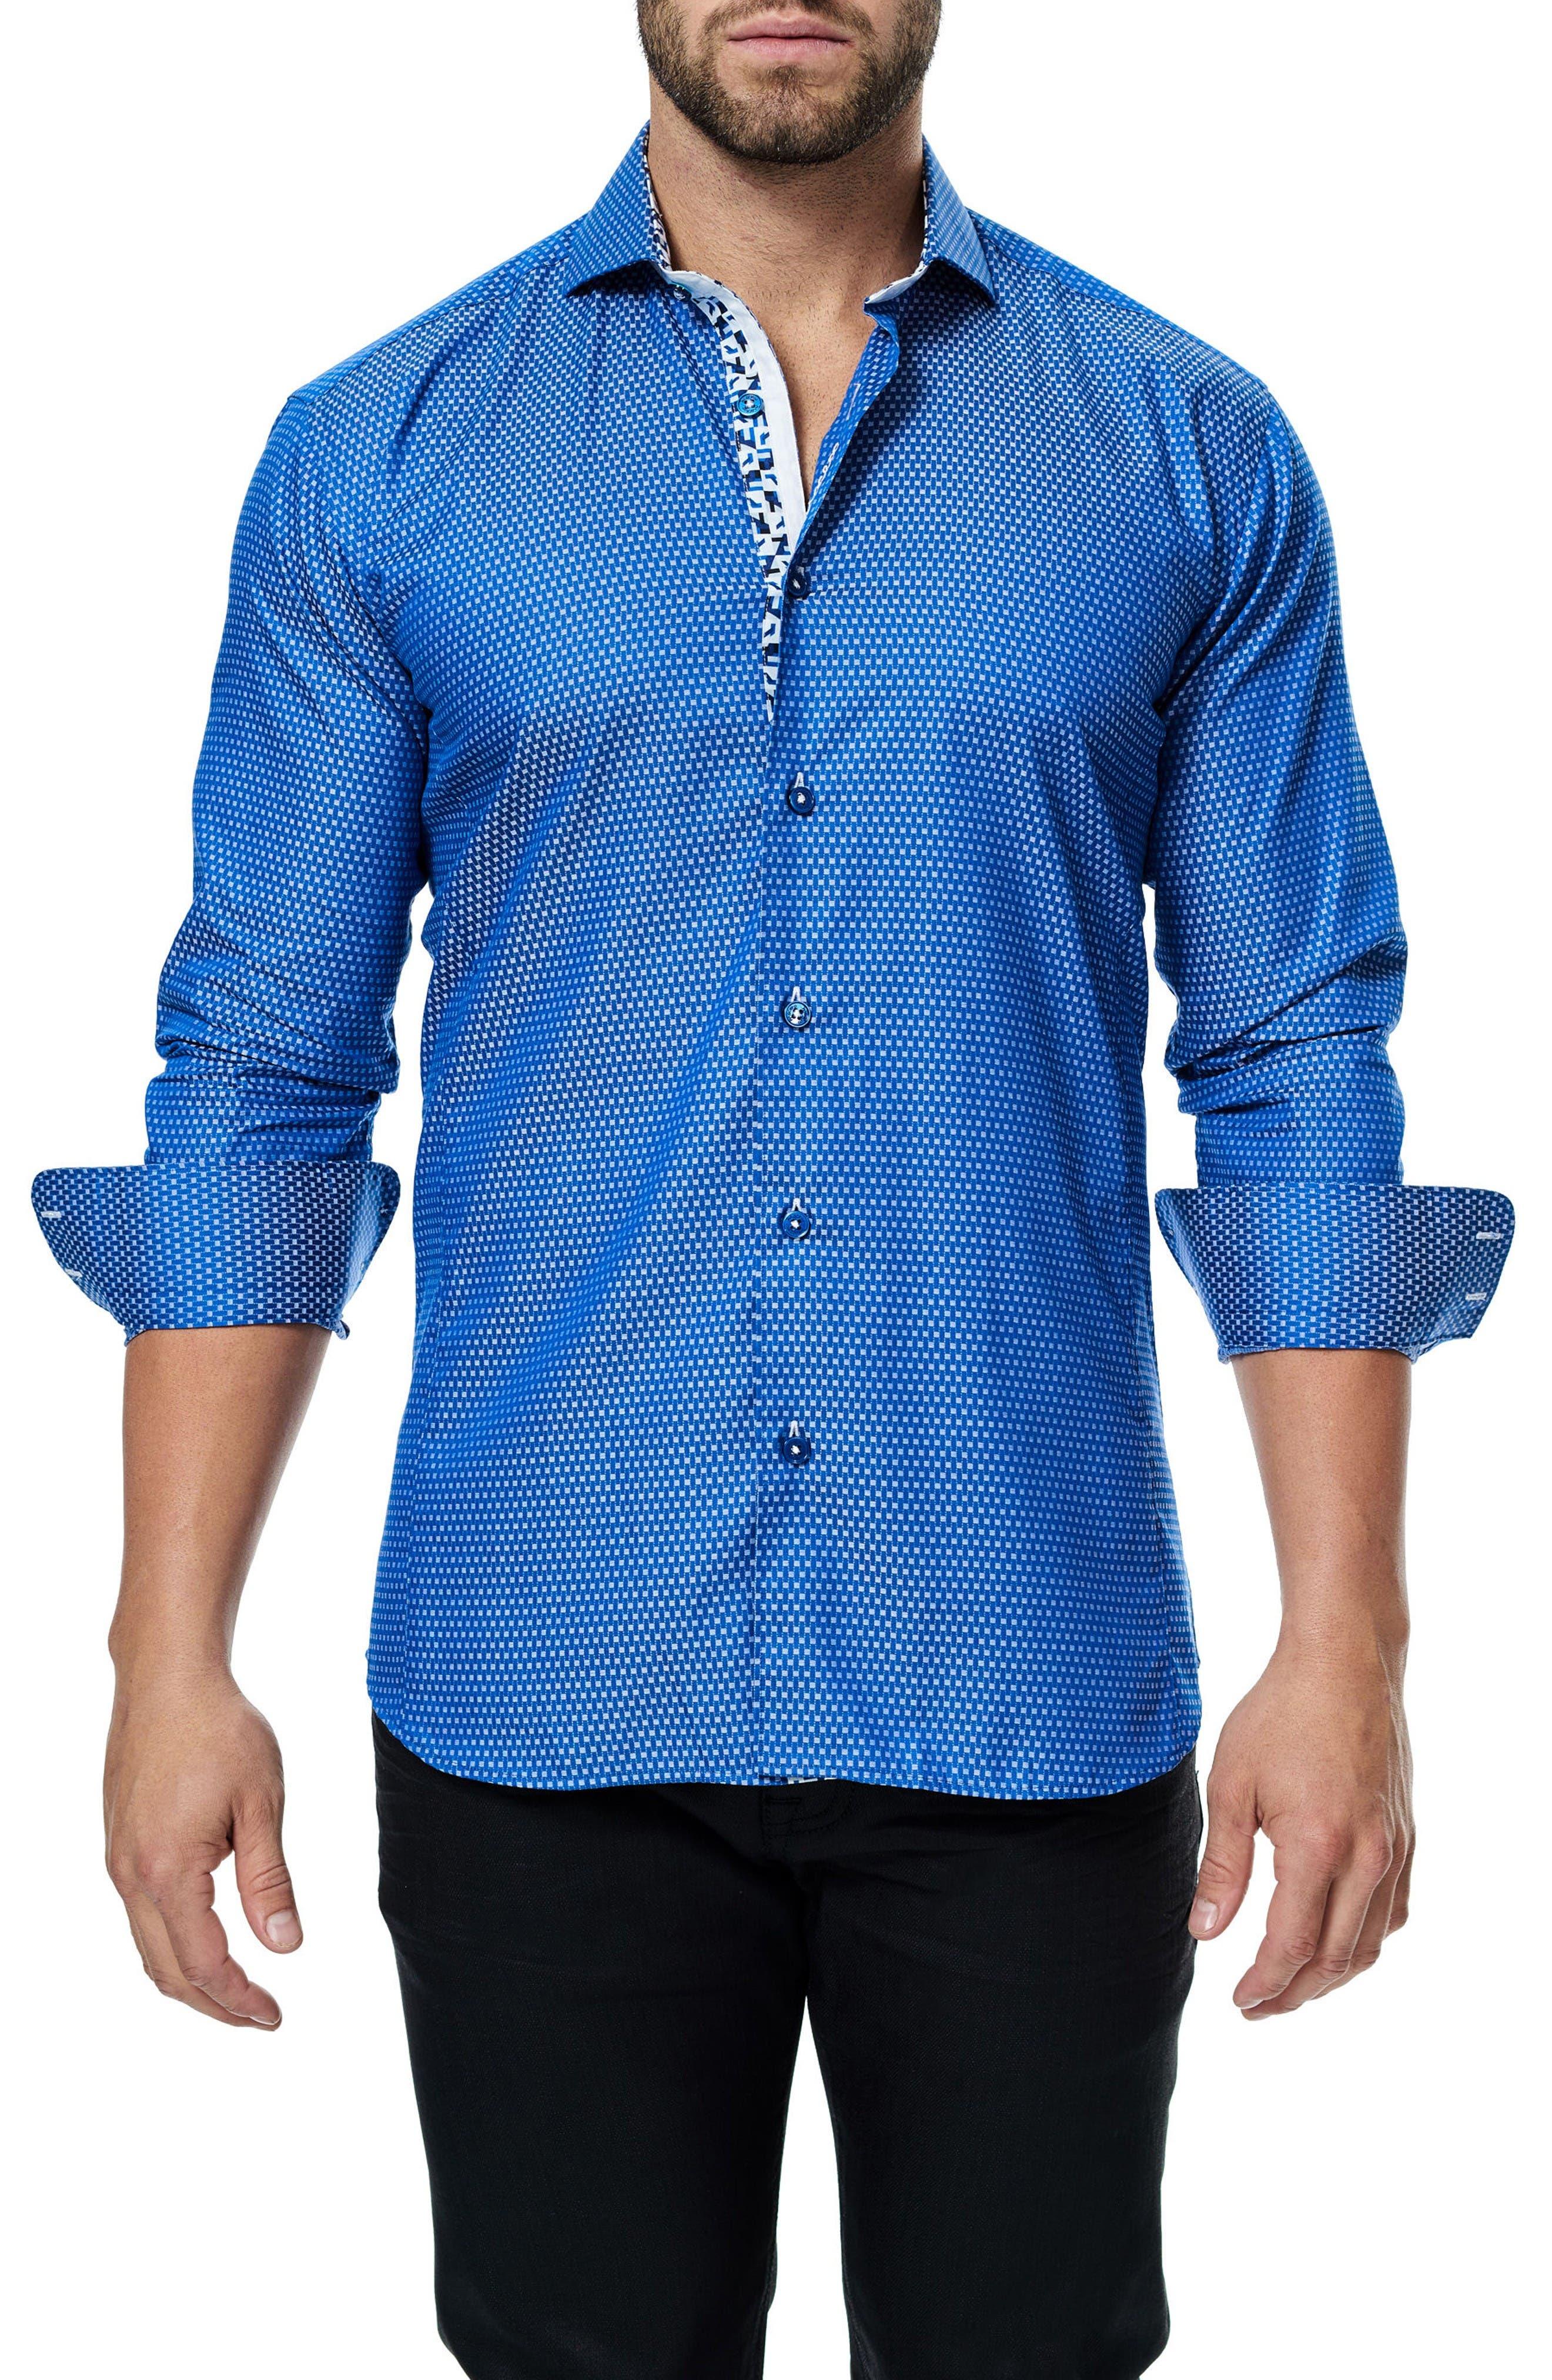 Main Image - Maceoo Wall Street Jacquard Sport Shirt